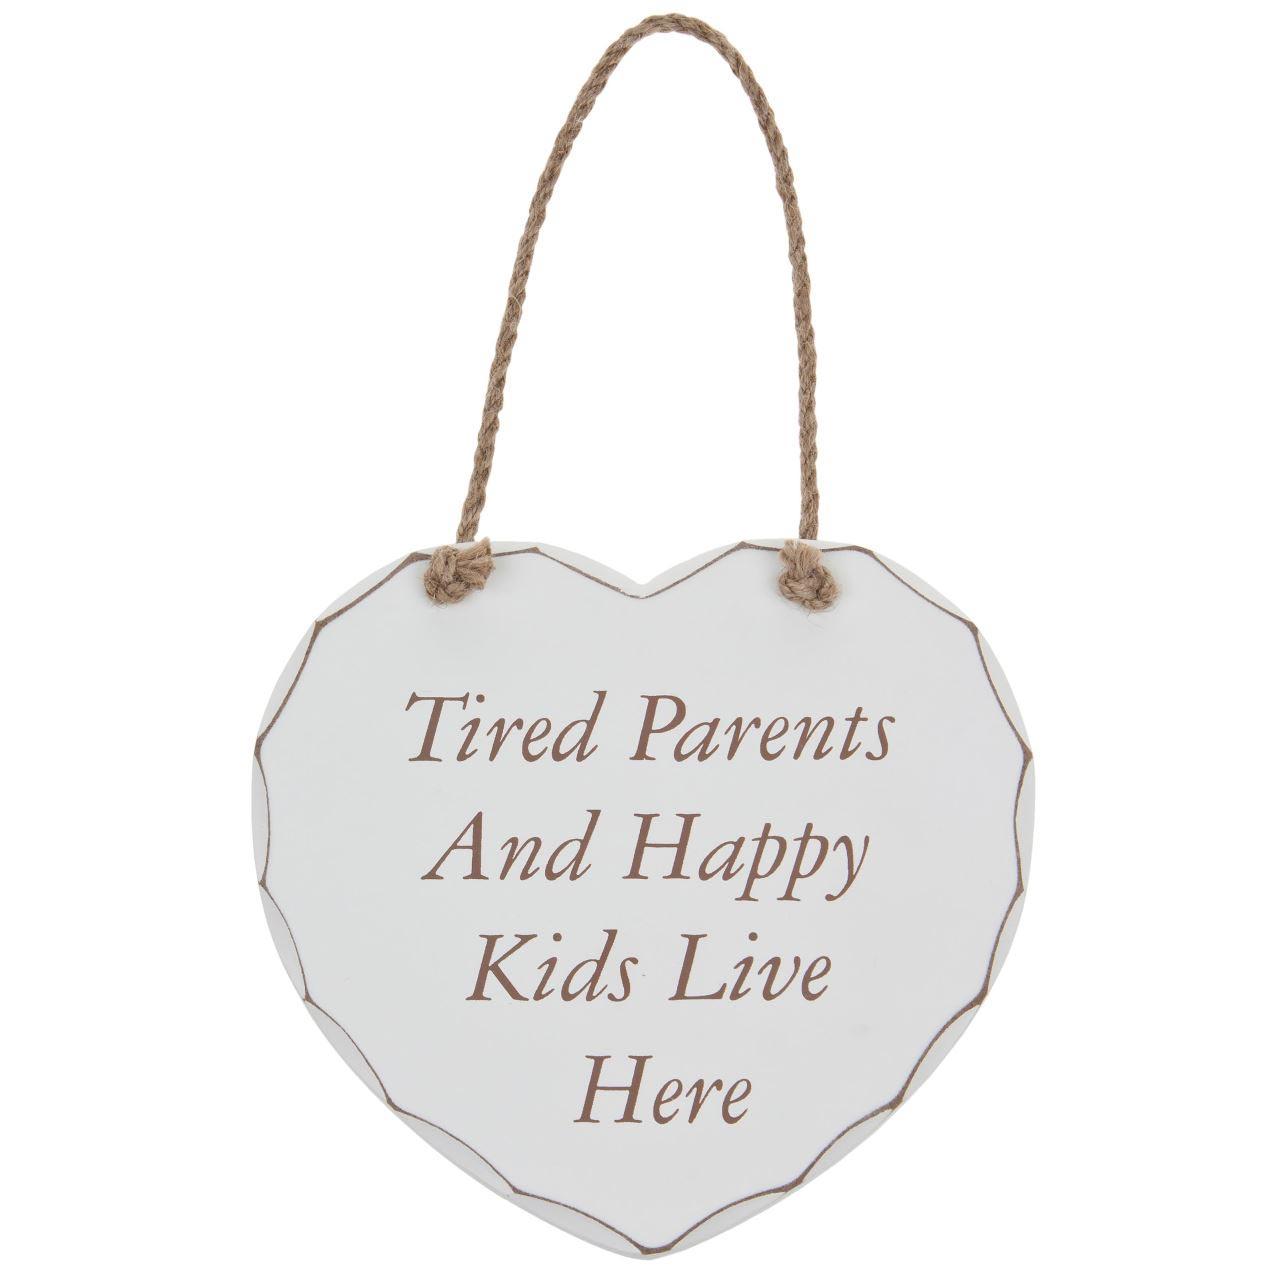 Placuta cu mesaj Tired Parents And Happy Kids Live Here